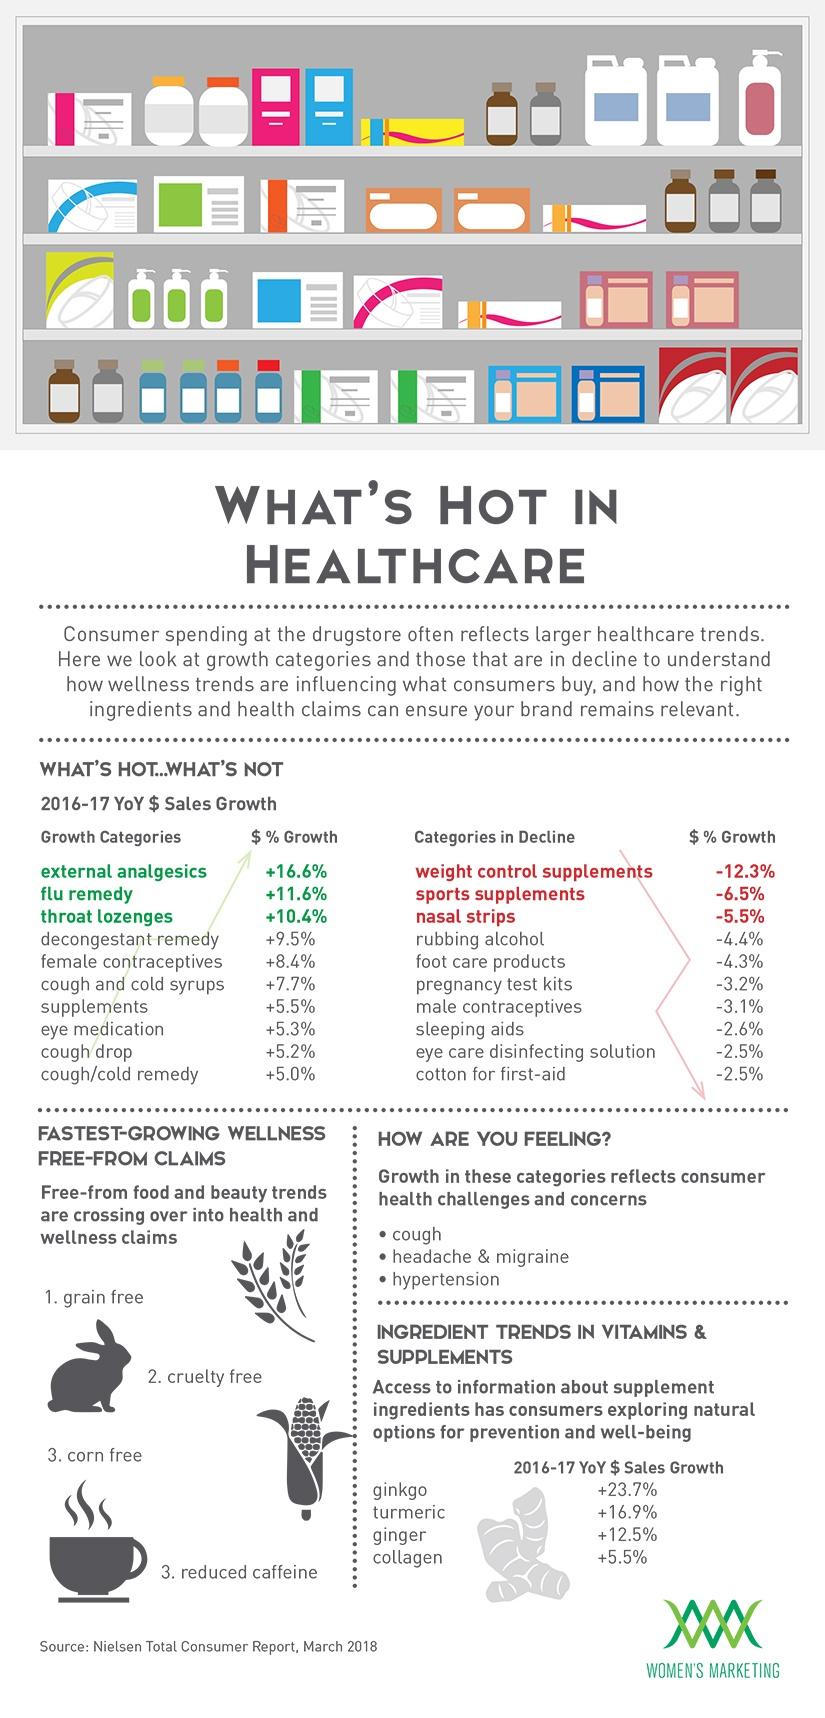 What'sHotInHealthcare_Infographic